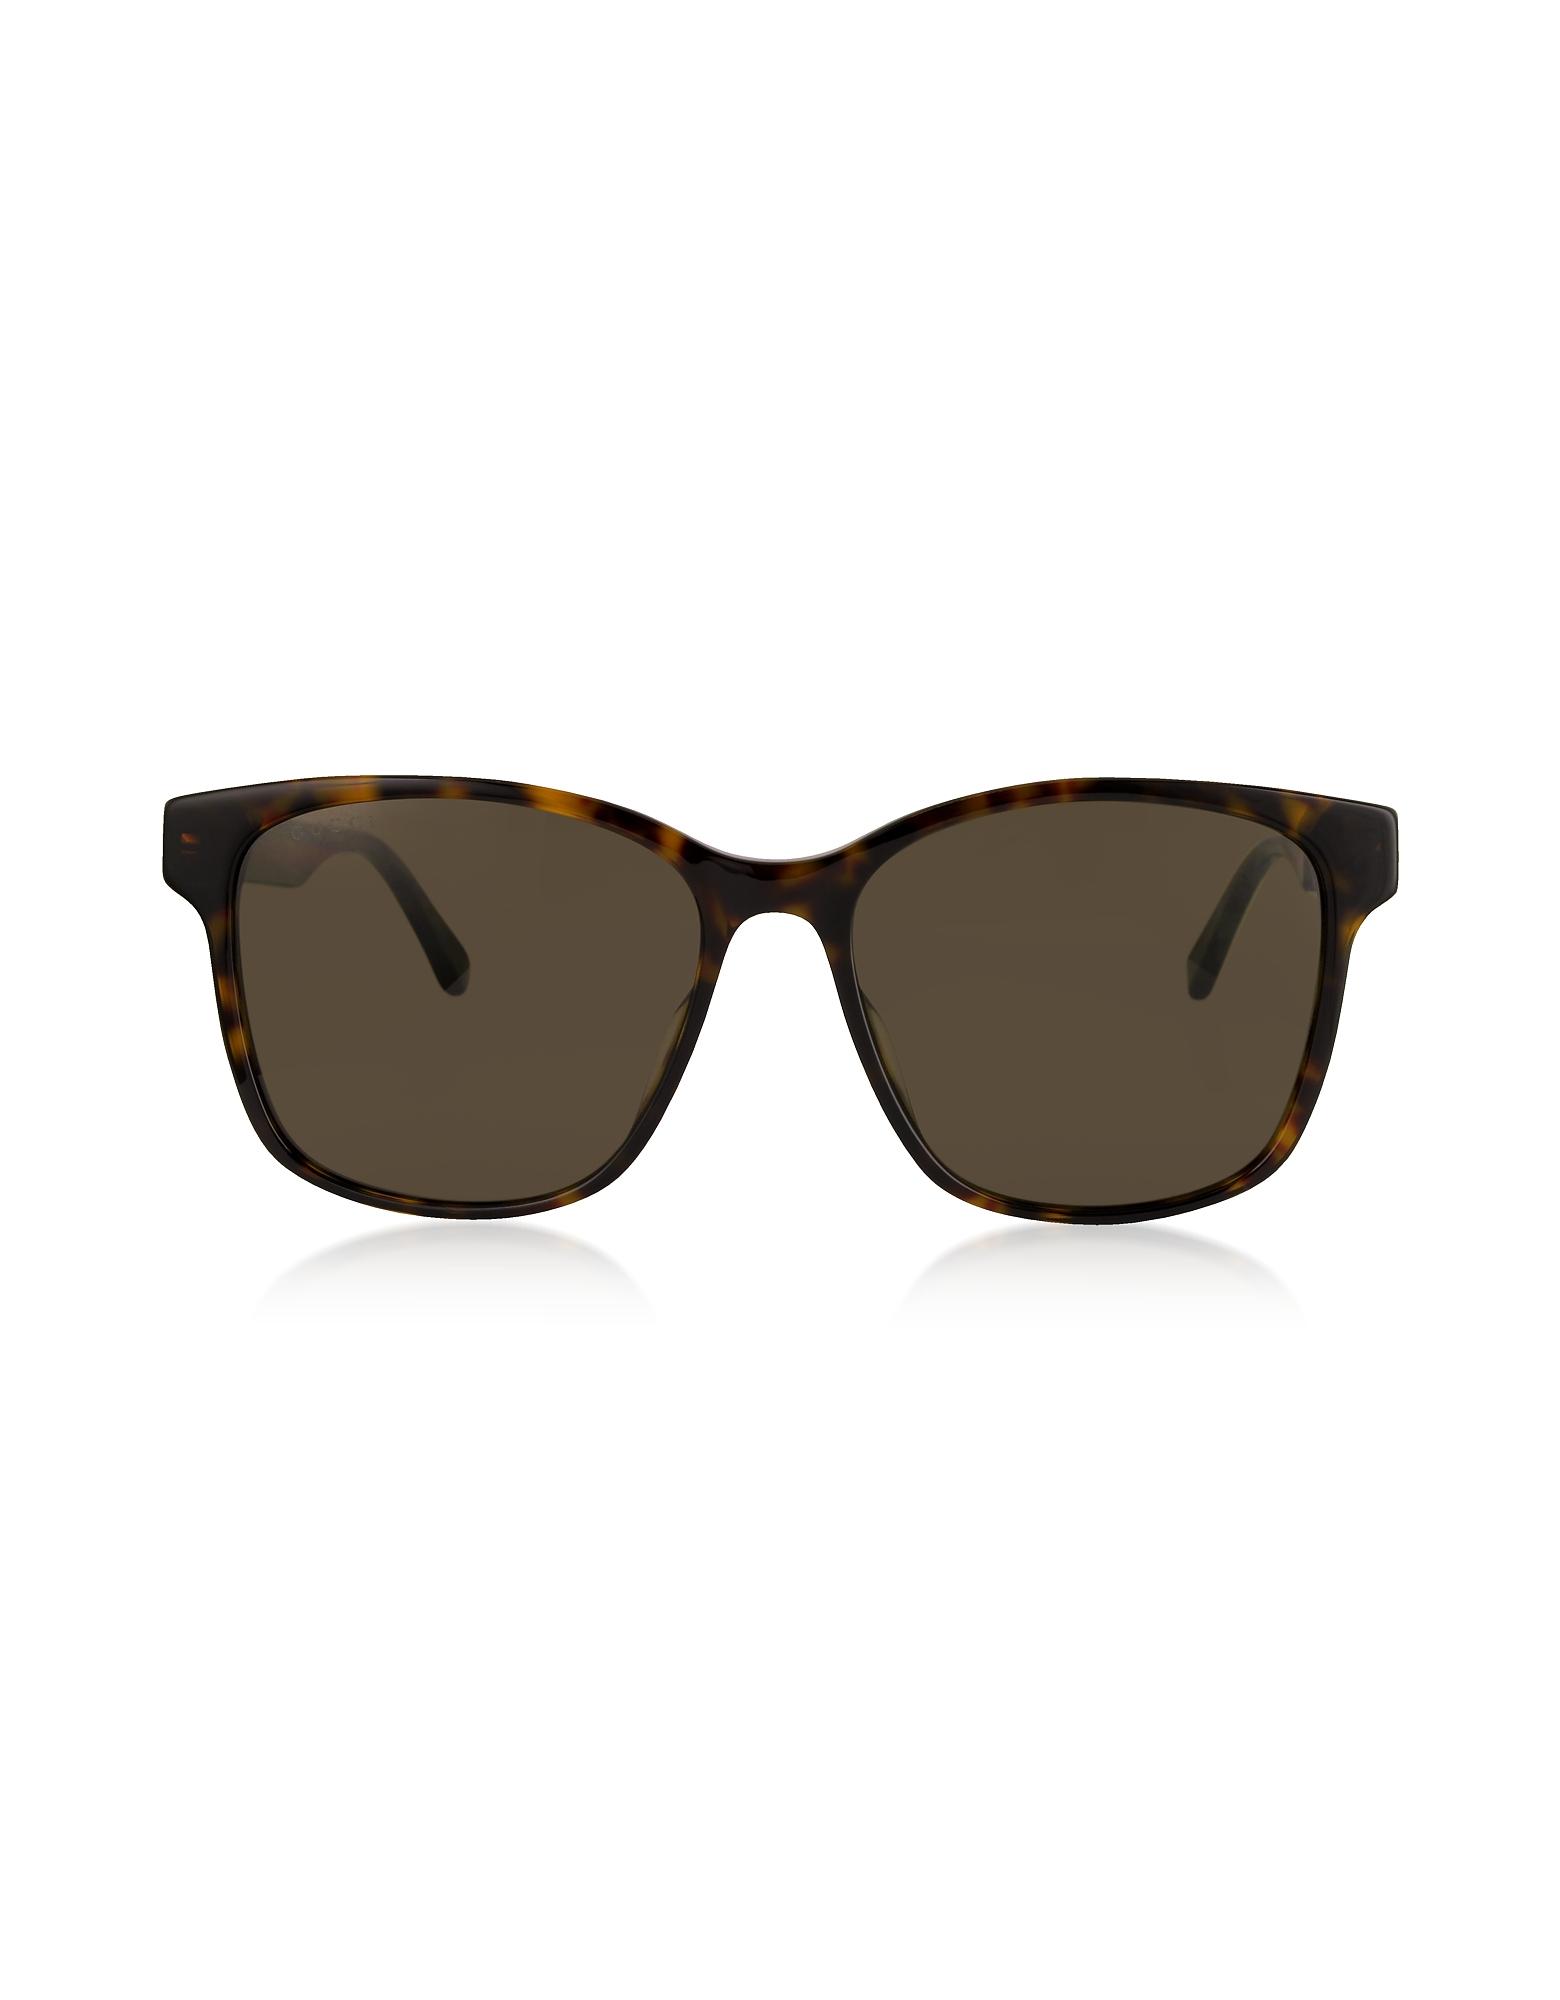 Gucci Sunglasses, Rectangular-frame Tortoise Acetate Sunglasses w/Web Temples